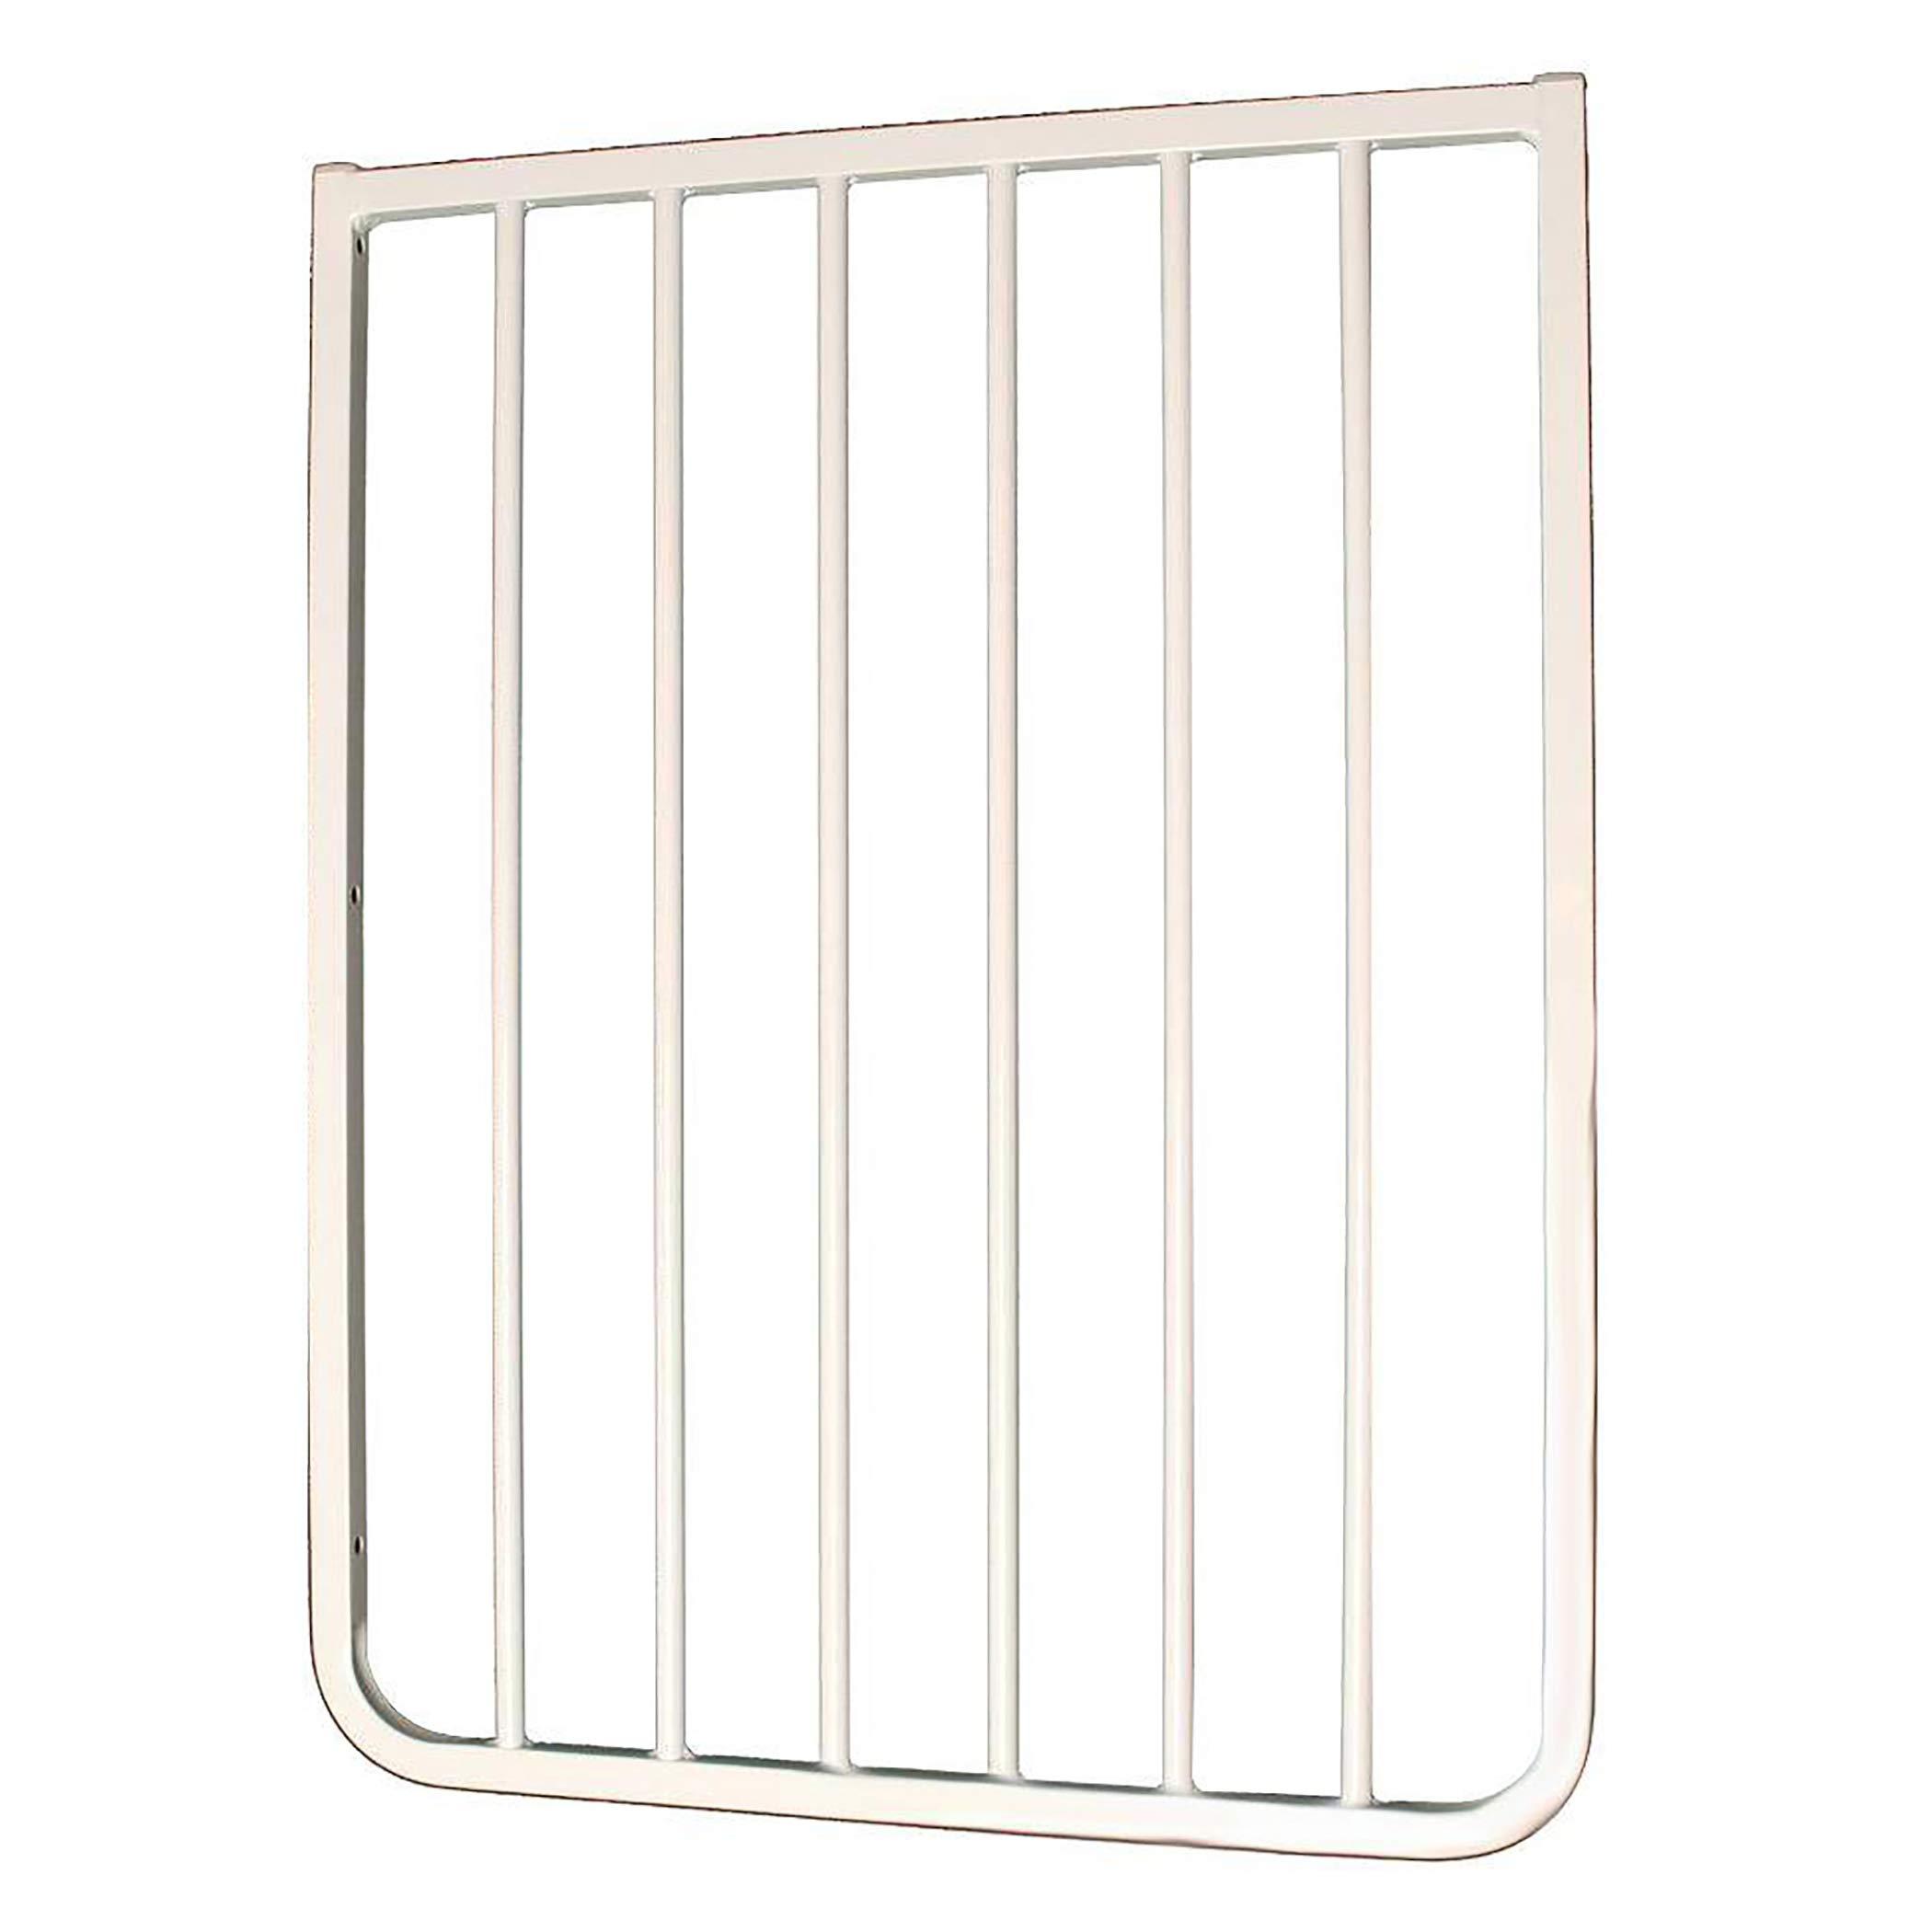 Cardinal Pet Gates 21.75-Inch Extension, White